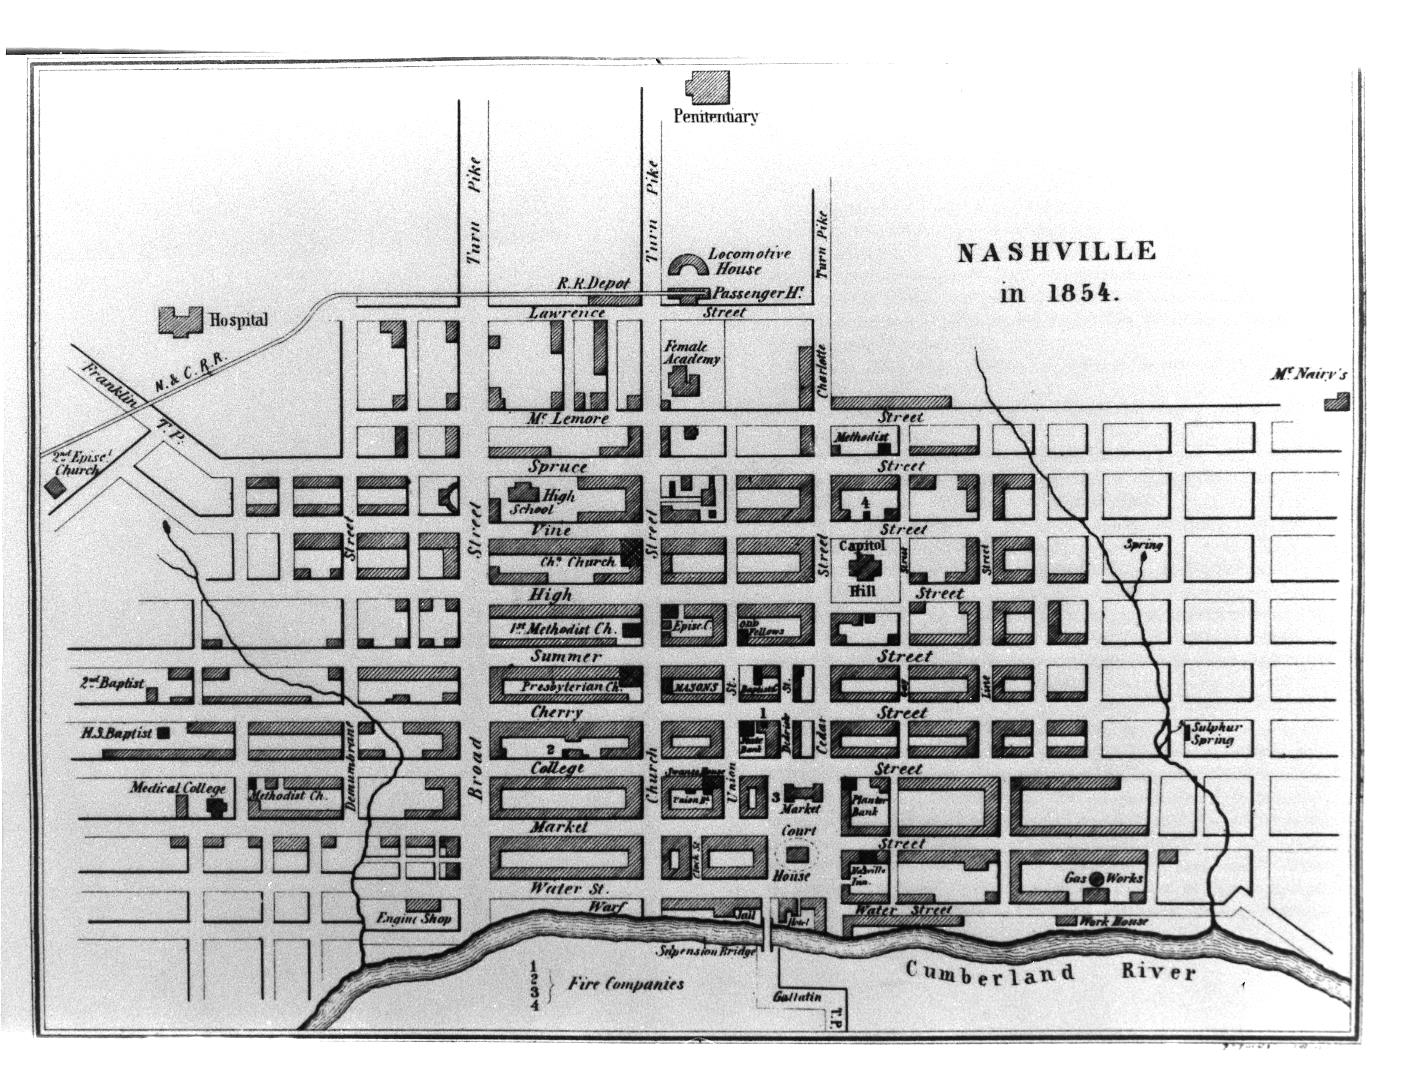 Map of Nashville, 1854